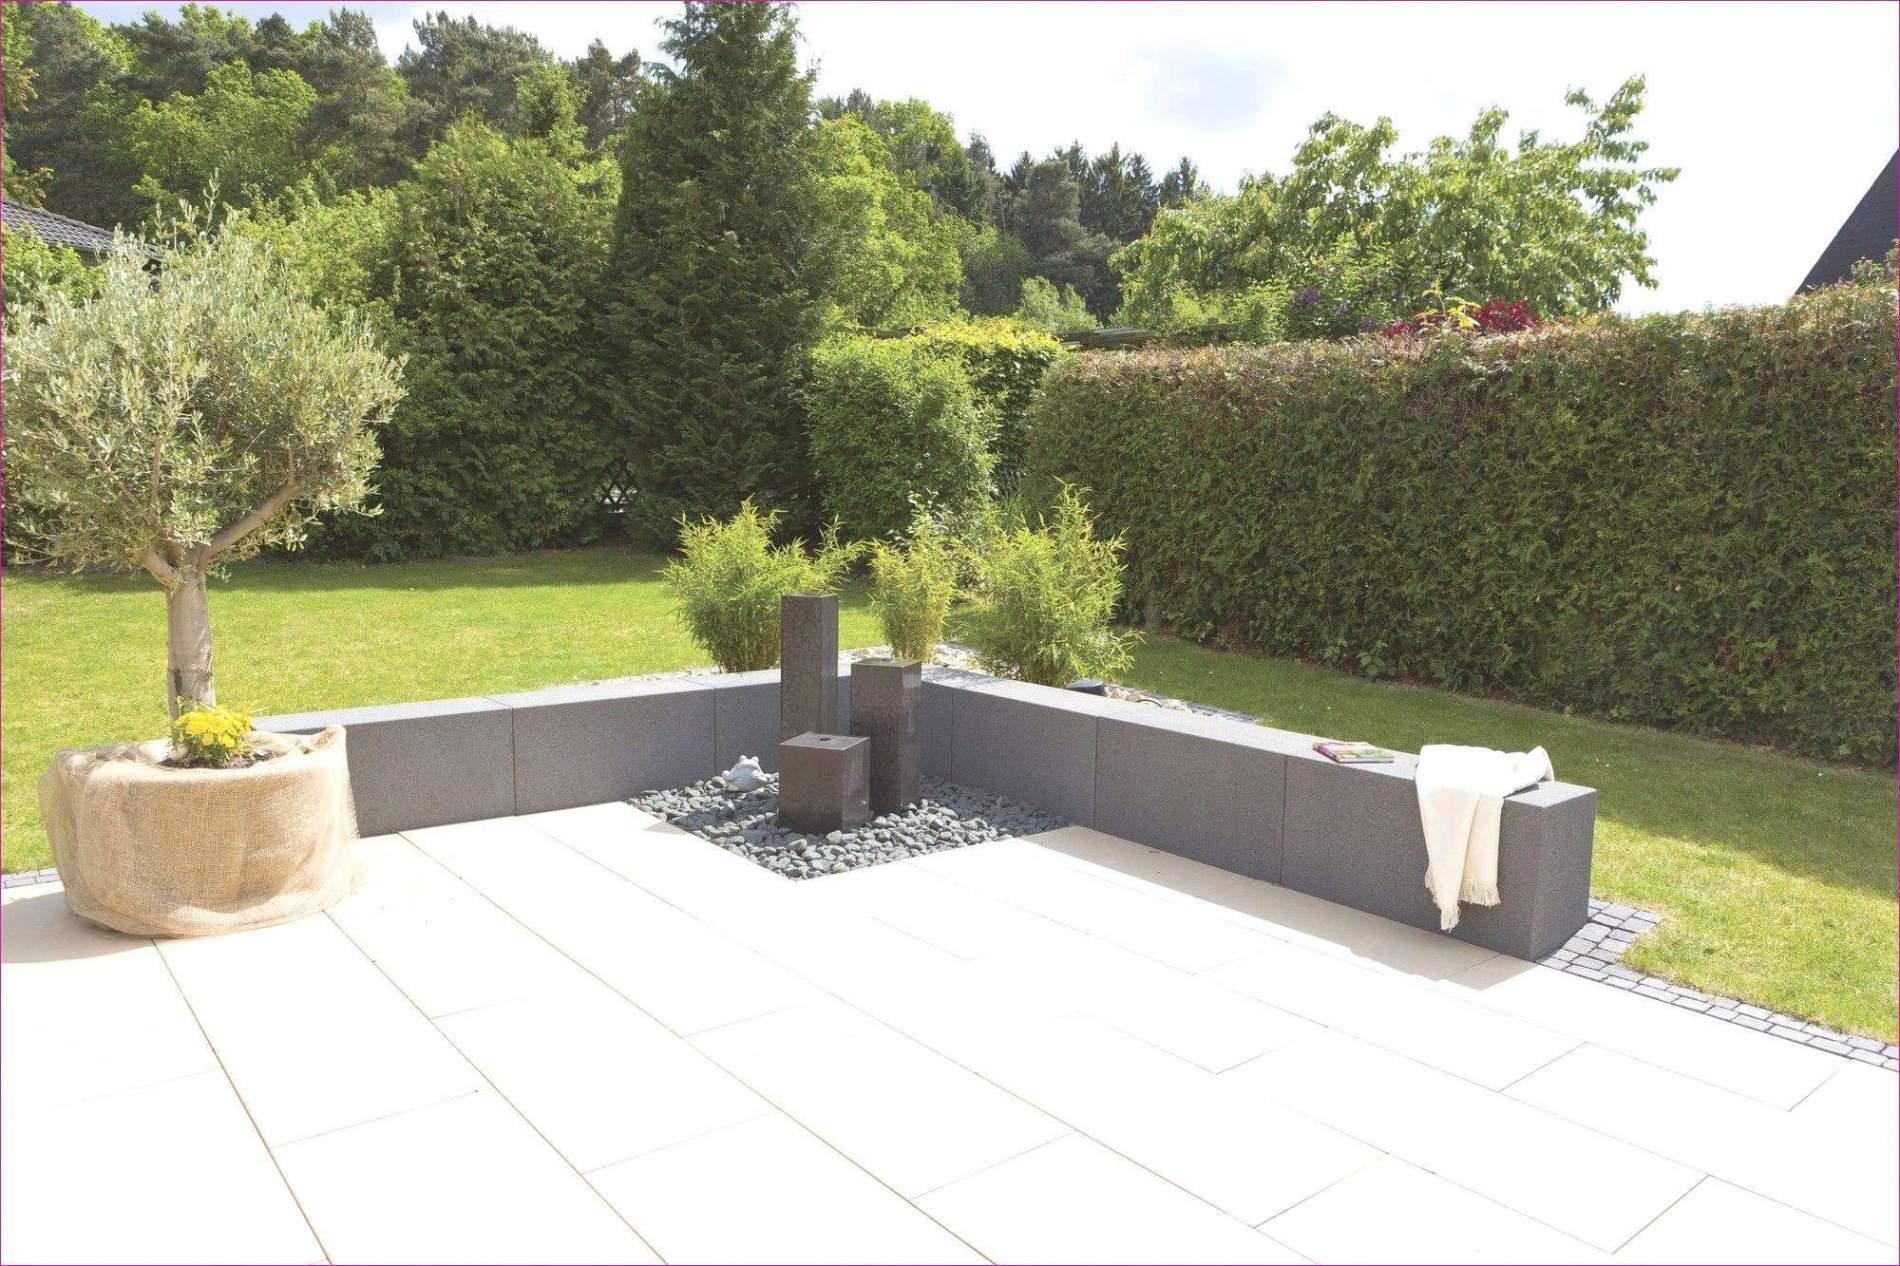 38 Elegant Garten Wissen Einzigartig Garten Anlegen